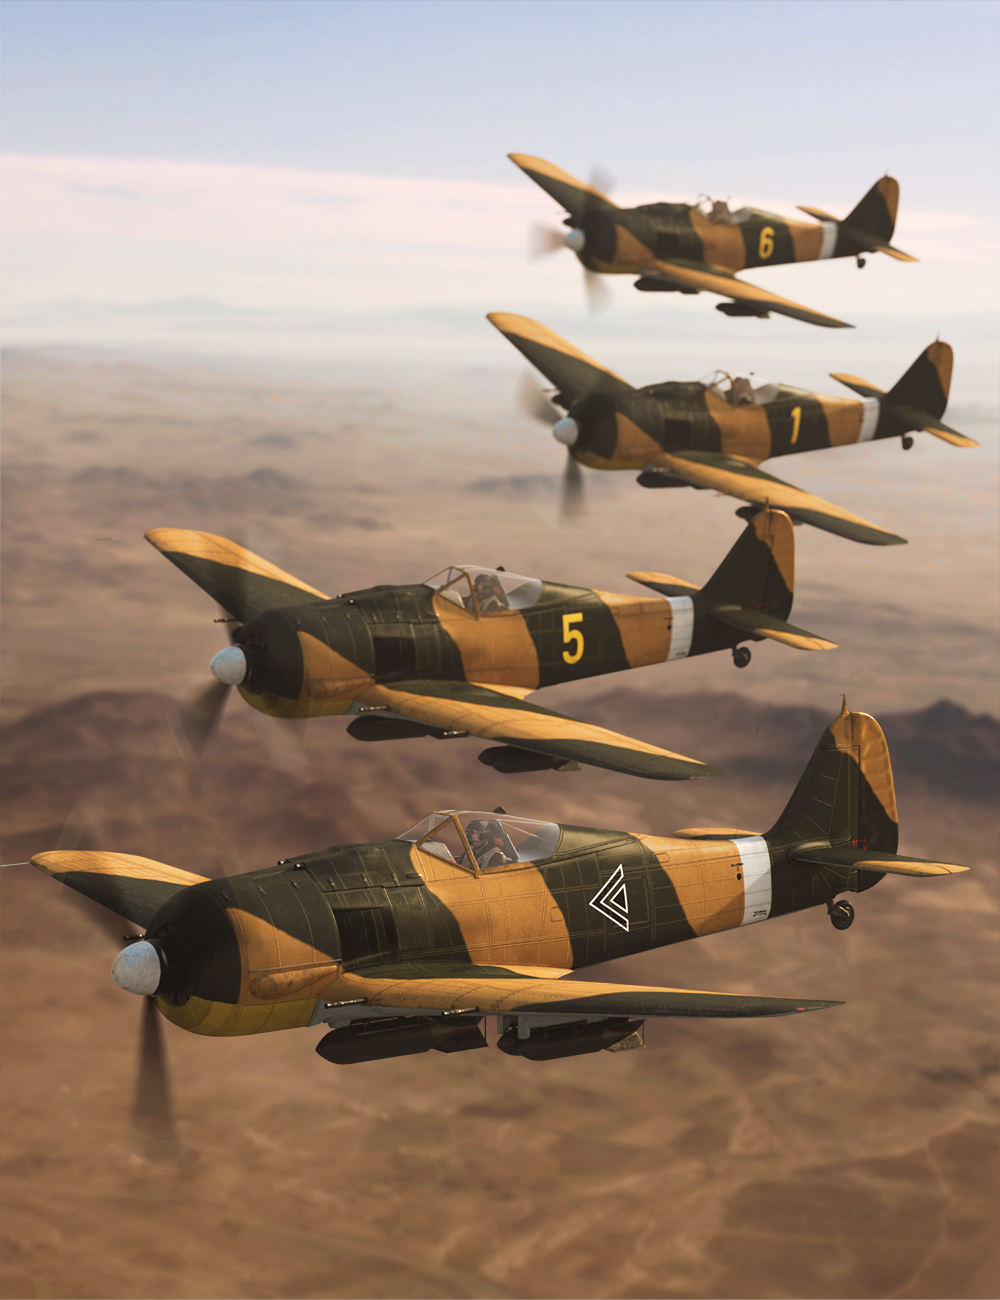 FW190 Warplane by: Predatron, 3D Models by Daz 3D